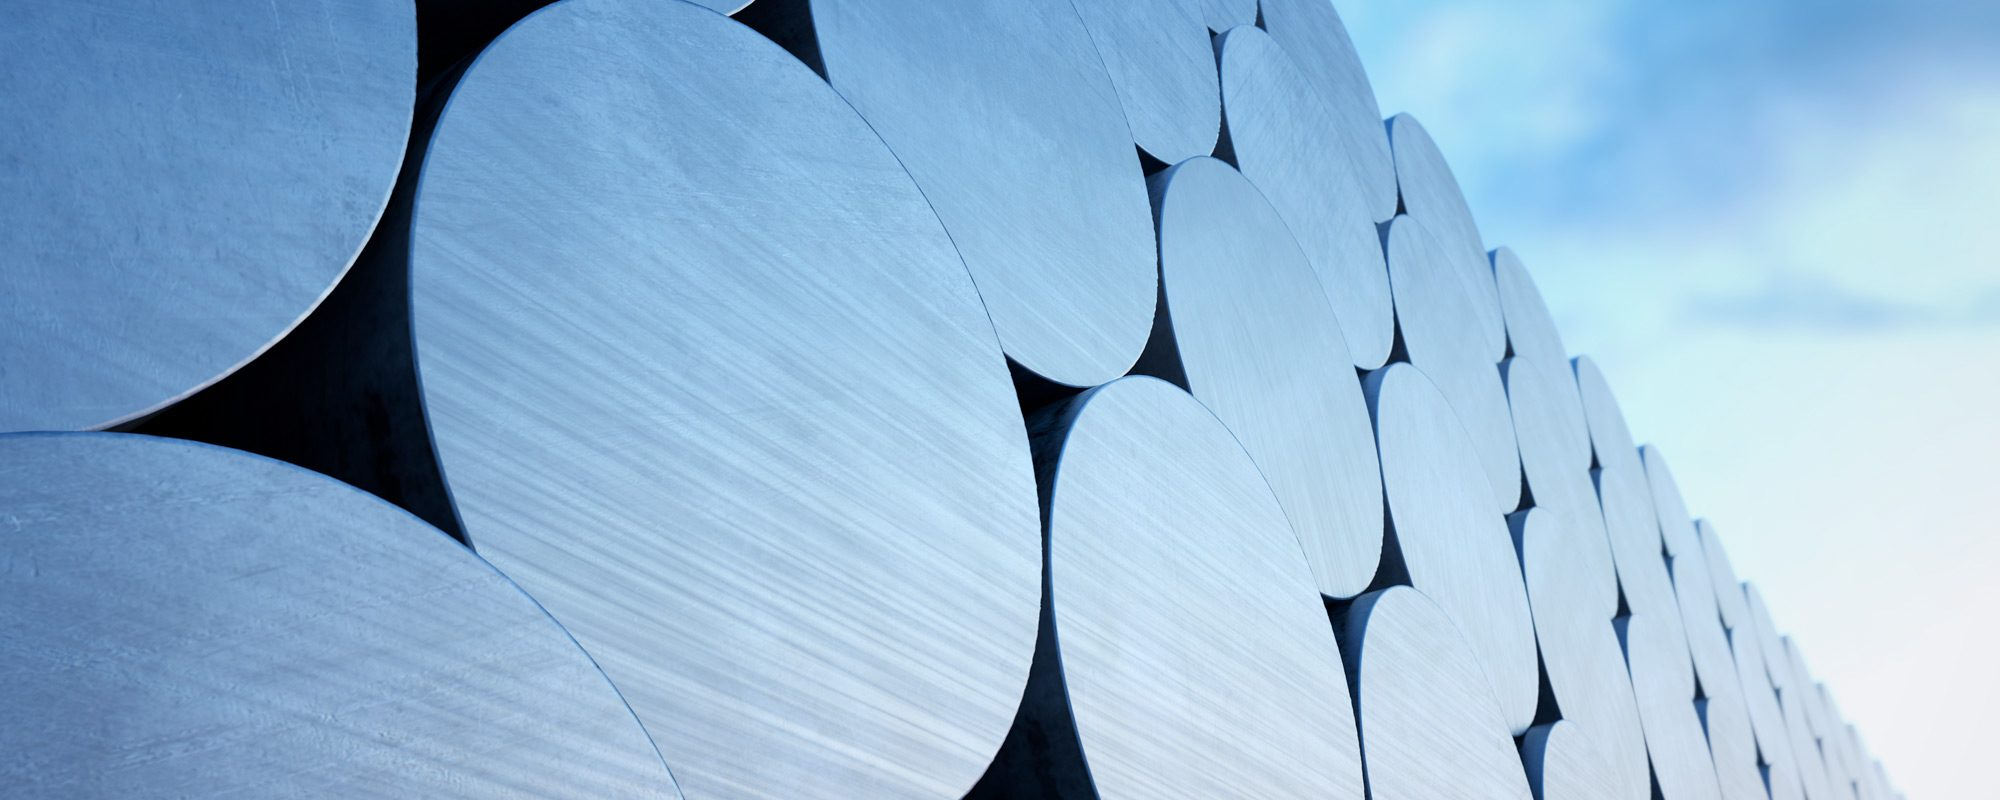 Carbon Steel - West Yorkshire Steel